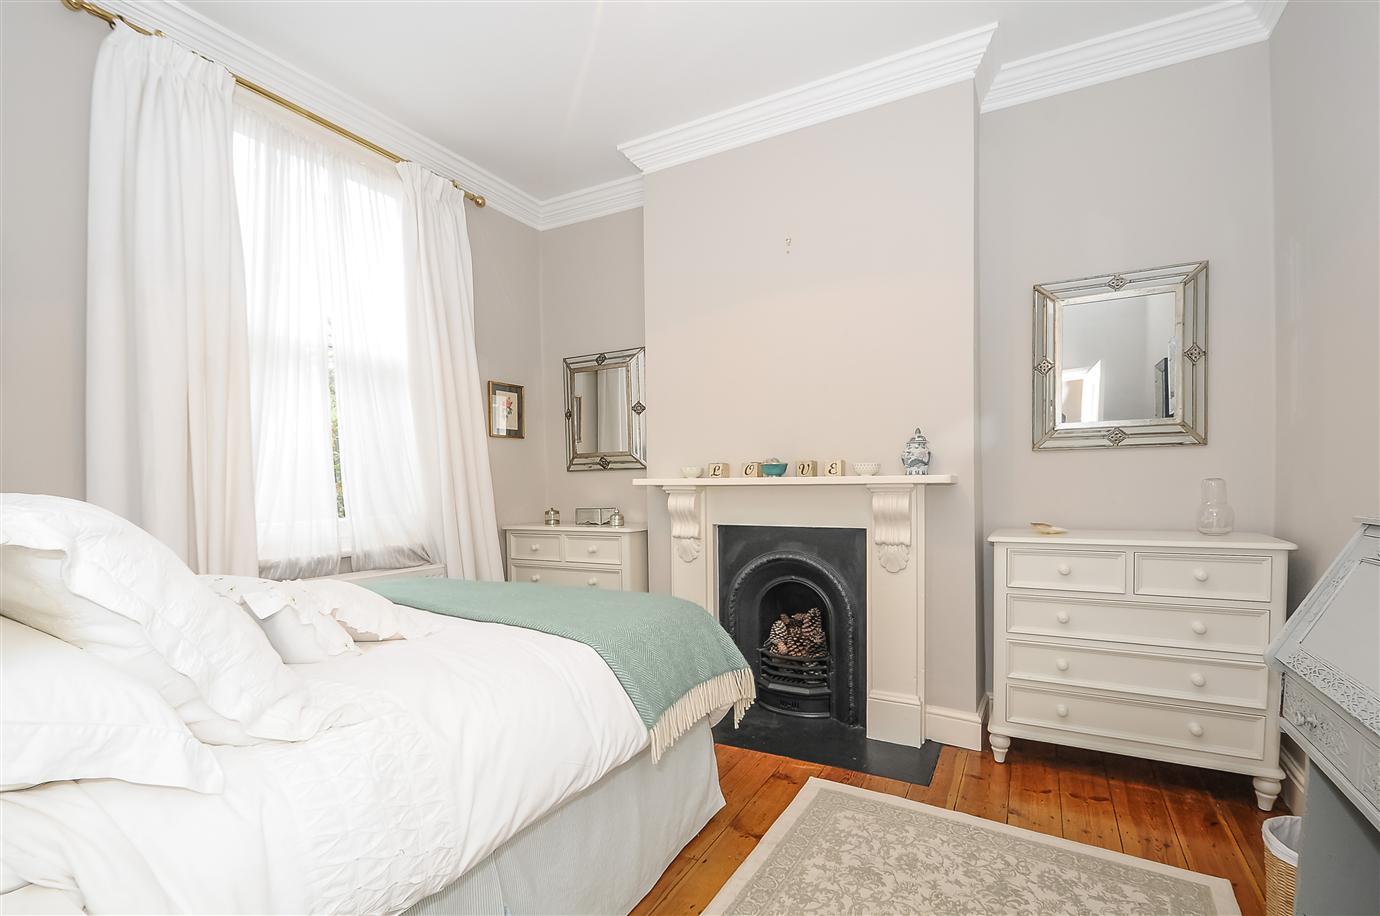 farrow ball cornforth white 228 eparket. Black Bedroom Furniture Sets. Home Design Ideas